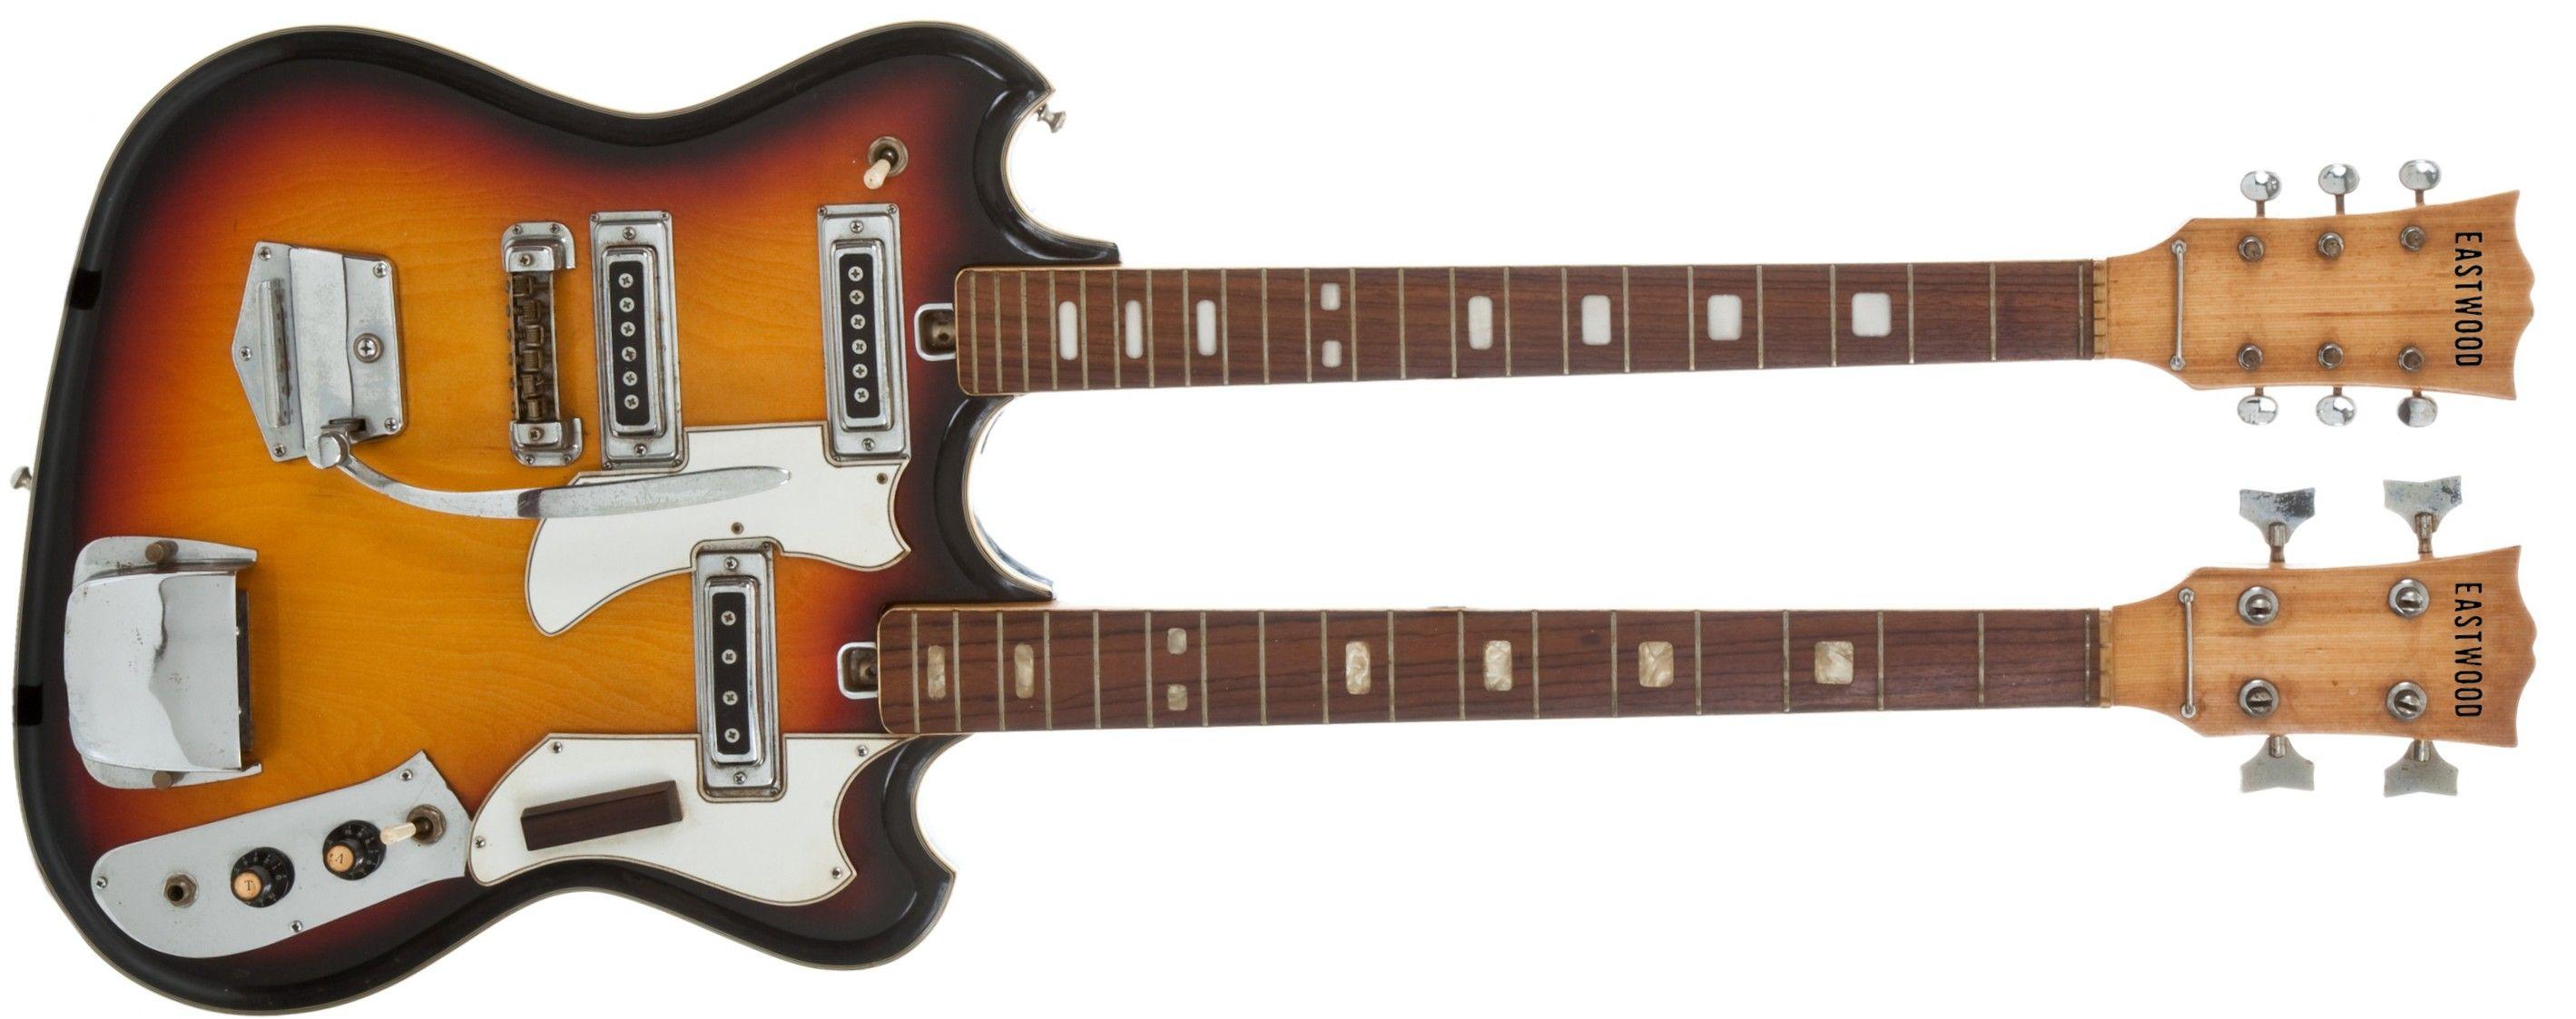 Agile Double Neck In 2020 Guitar Custom Guitars Cool Guitar